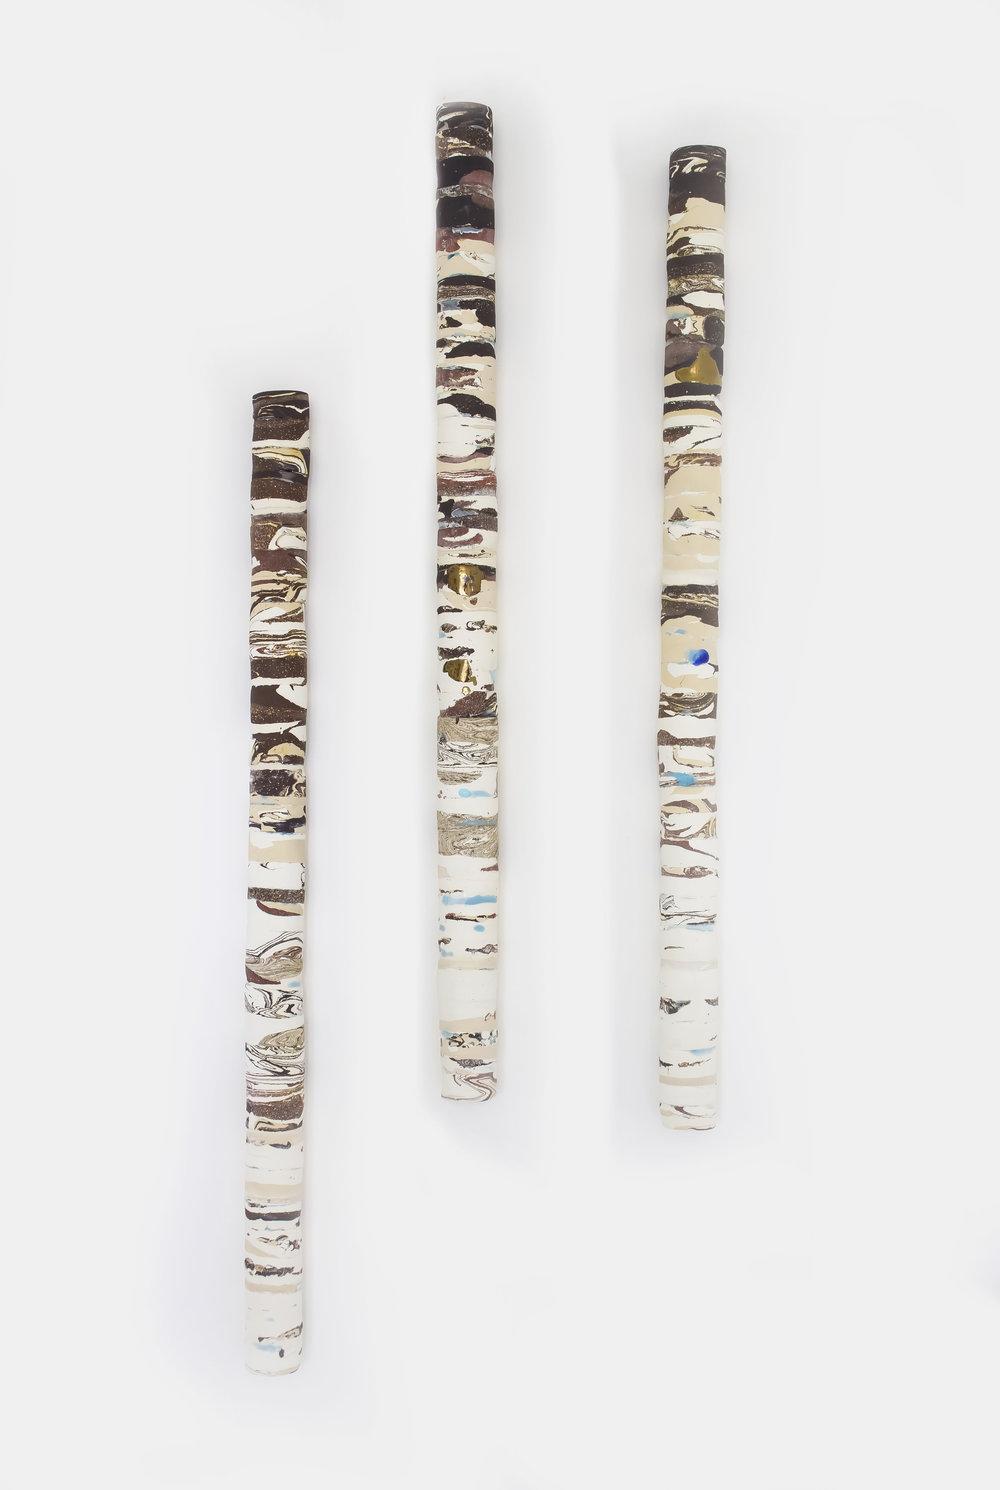 Jenny Beavan  Inner Cores - wall hung -  7 clays -gold glaze  -1m.jpg